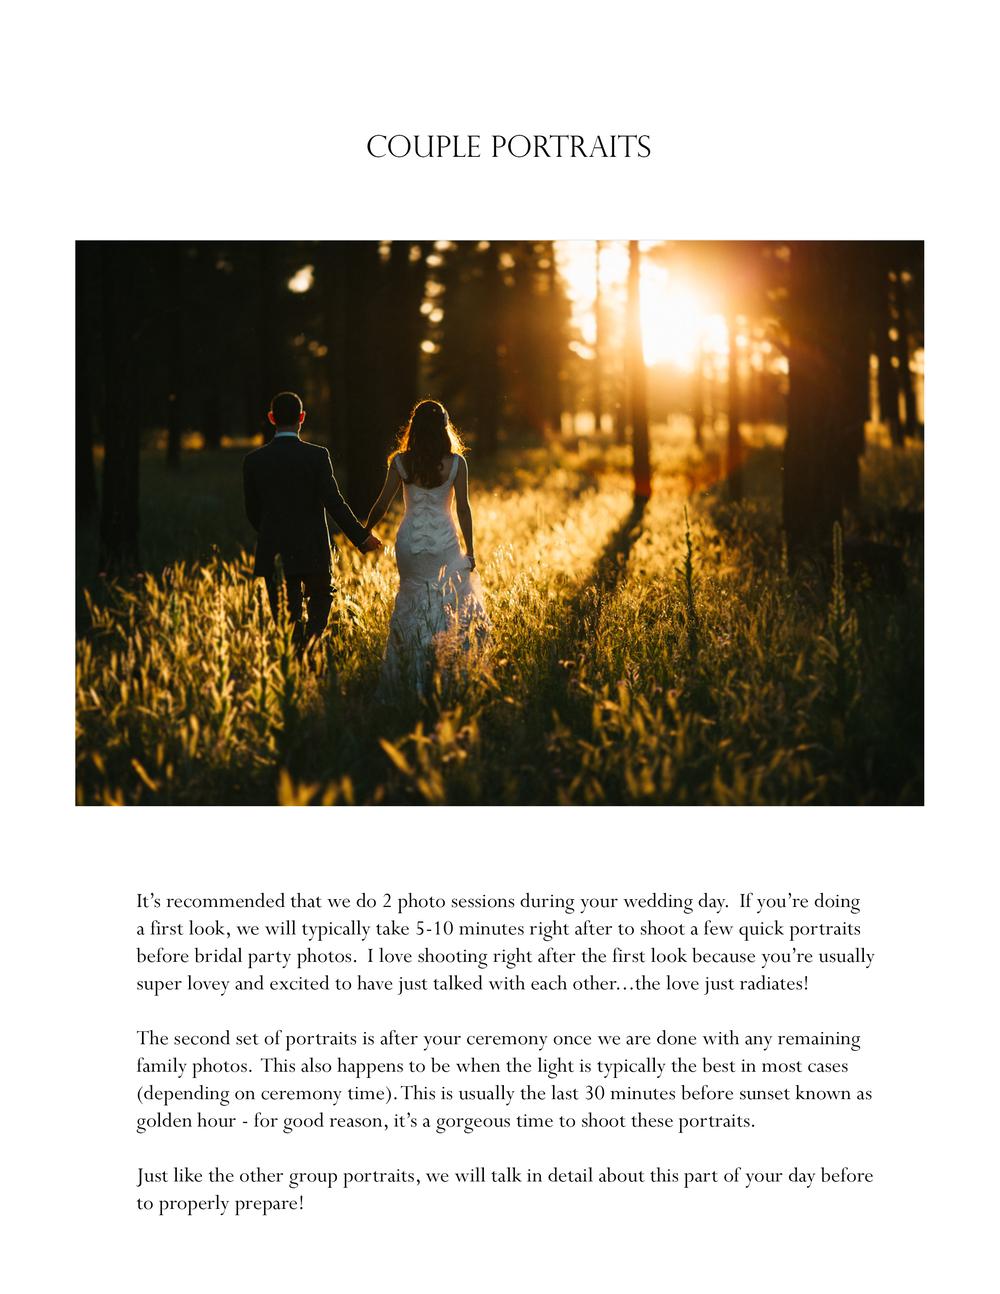 Wedding PDF Page 4.jpg